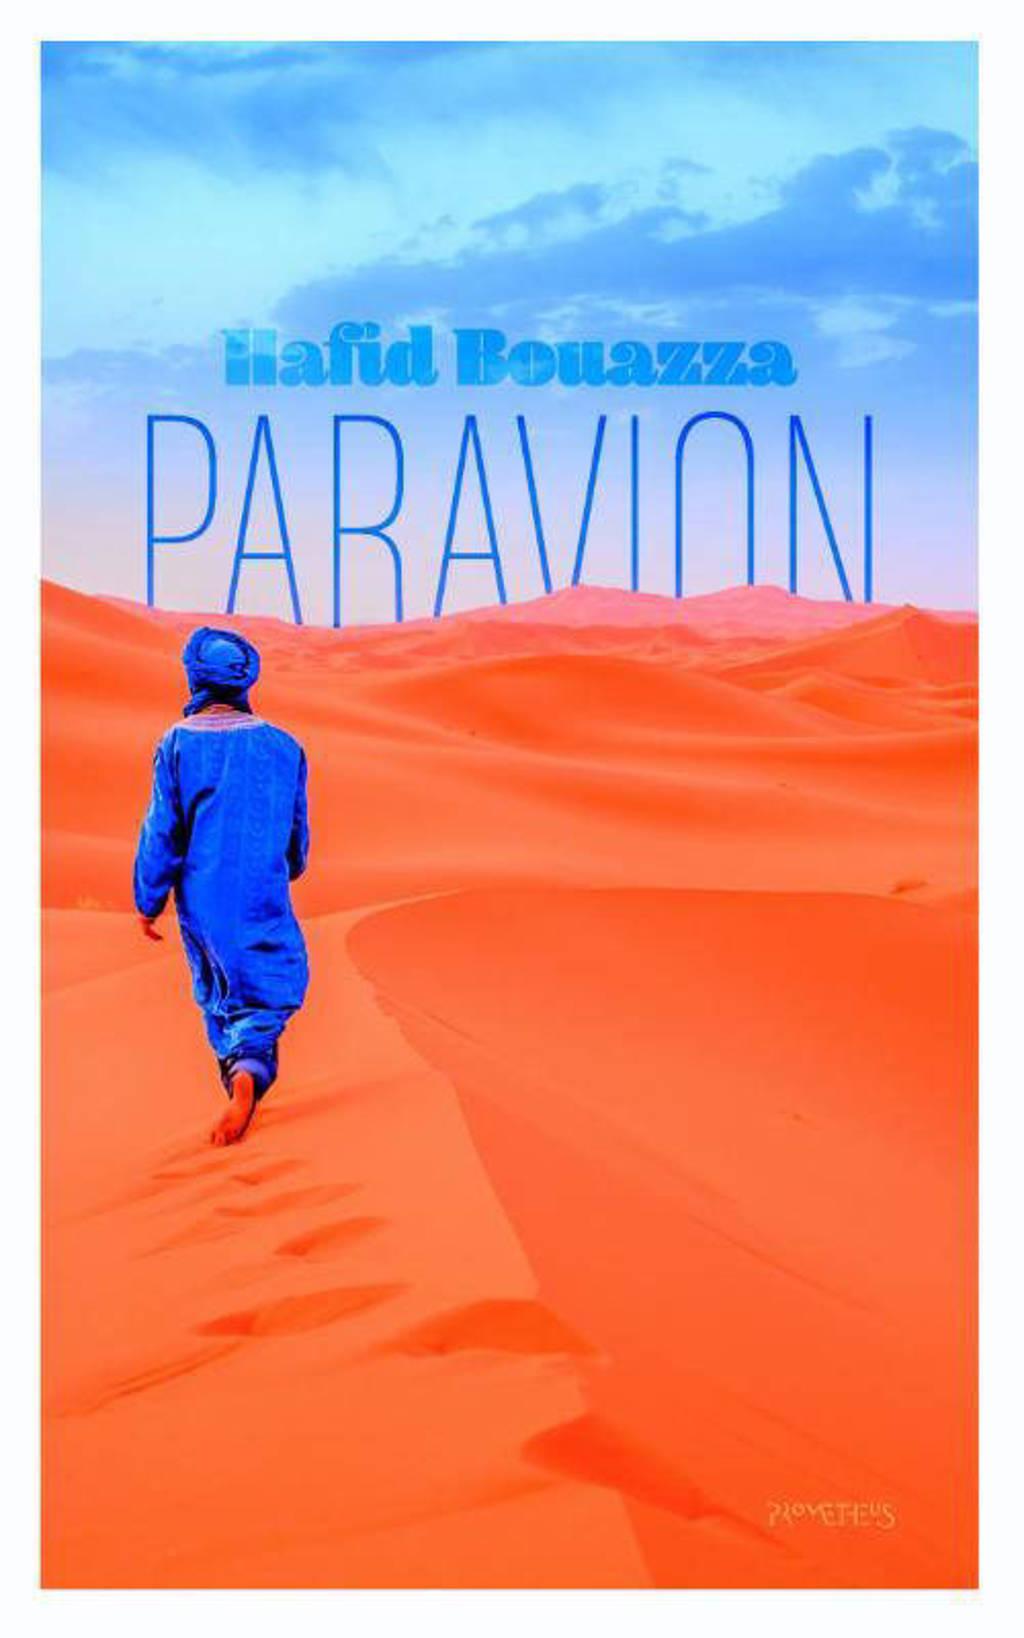 Paravion - Hafid Bouazza